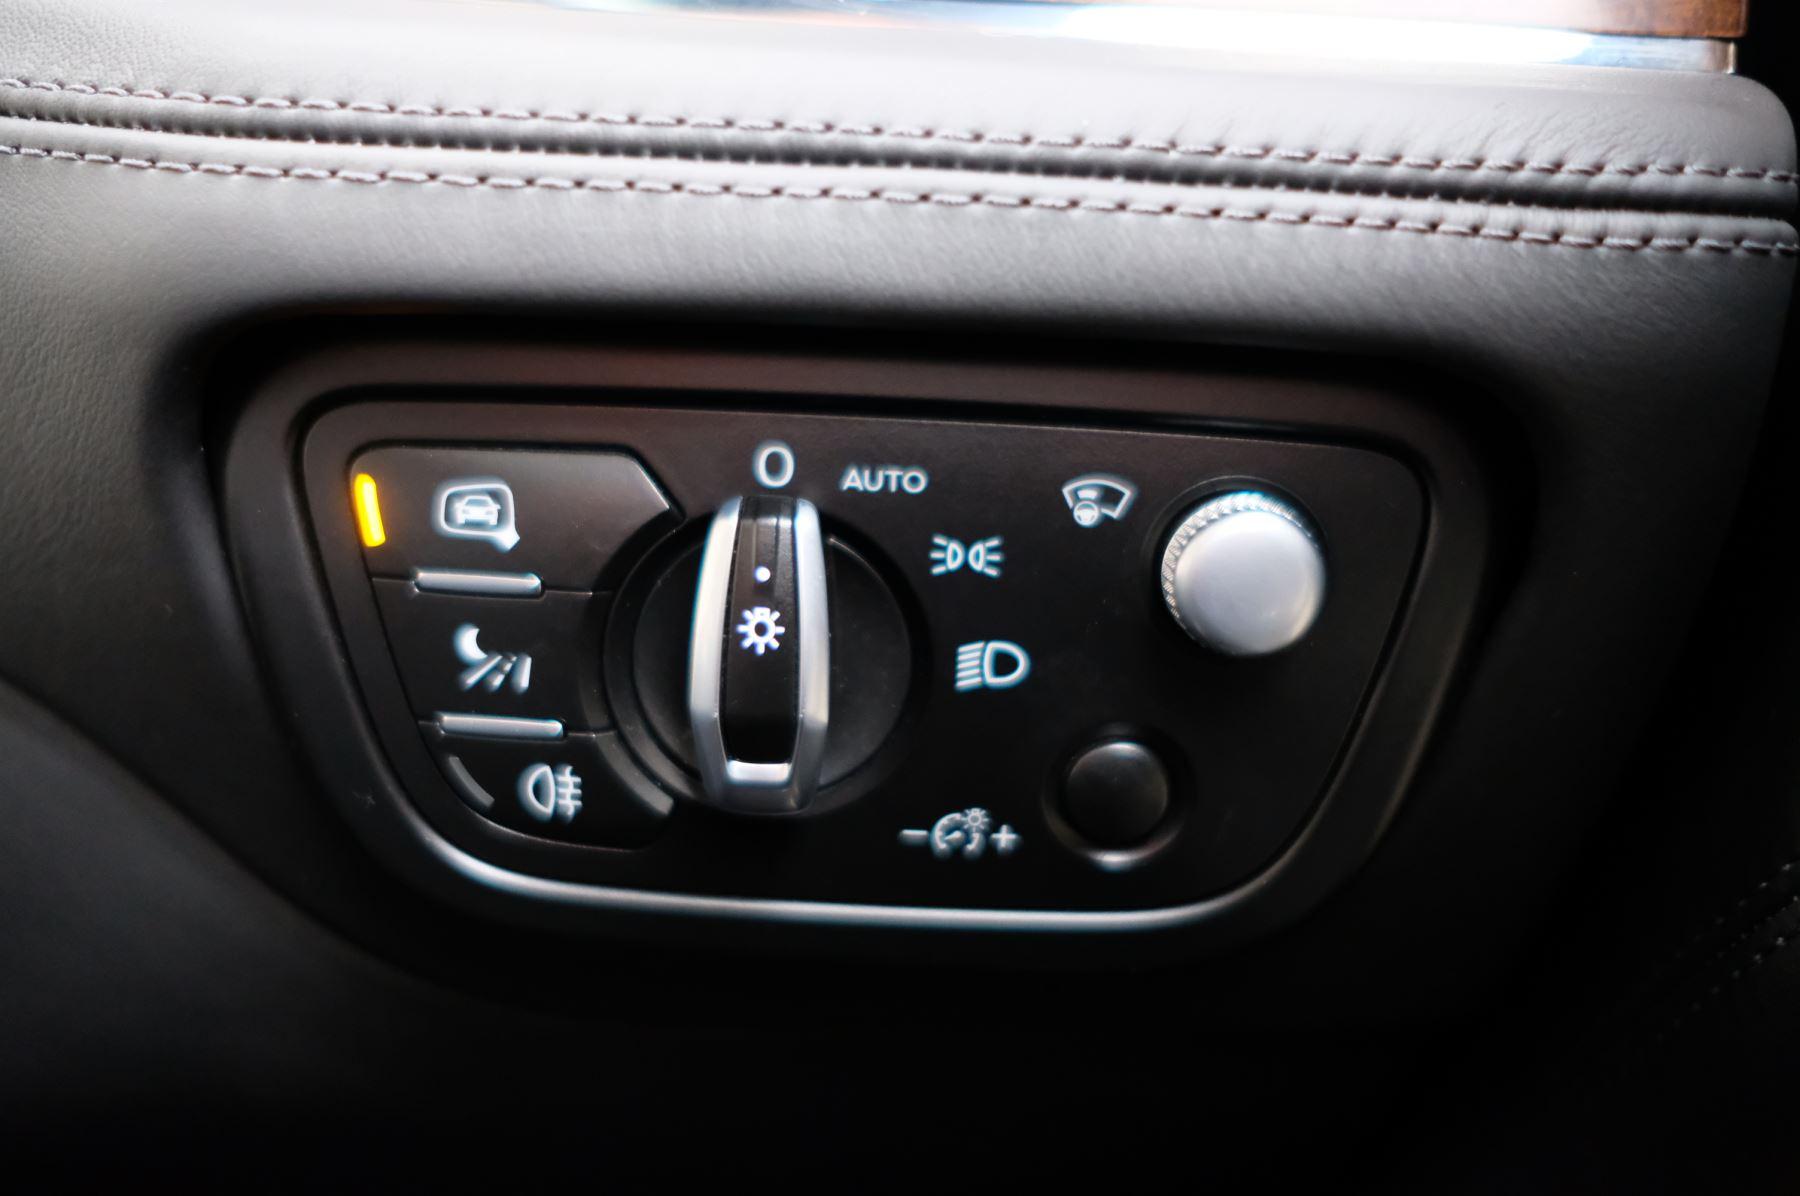 Bentley Bentayga Diesel 4.0 V8 Mulliner Driving Spec 5dr Auto - 7 Seat Specification image 28